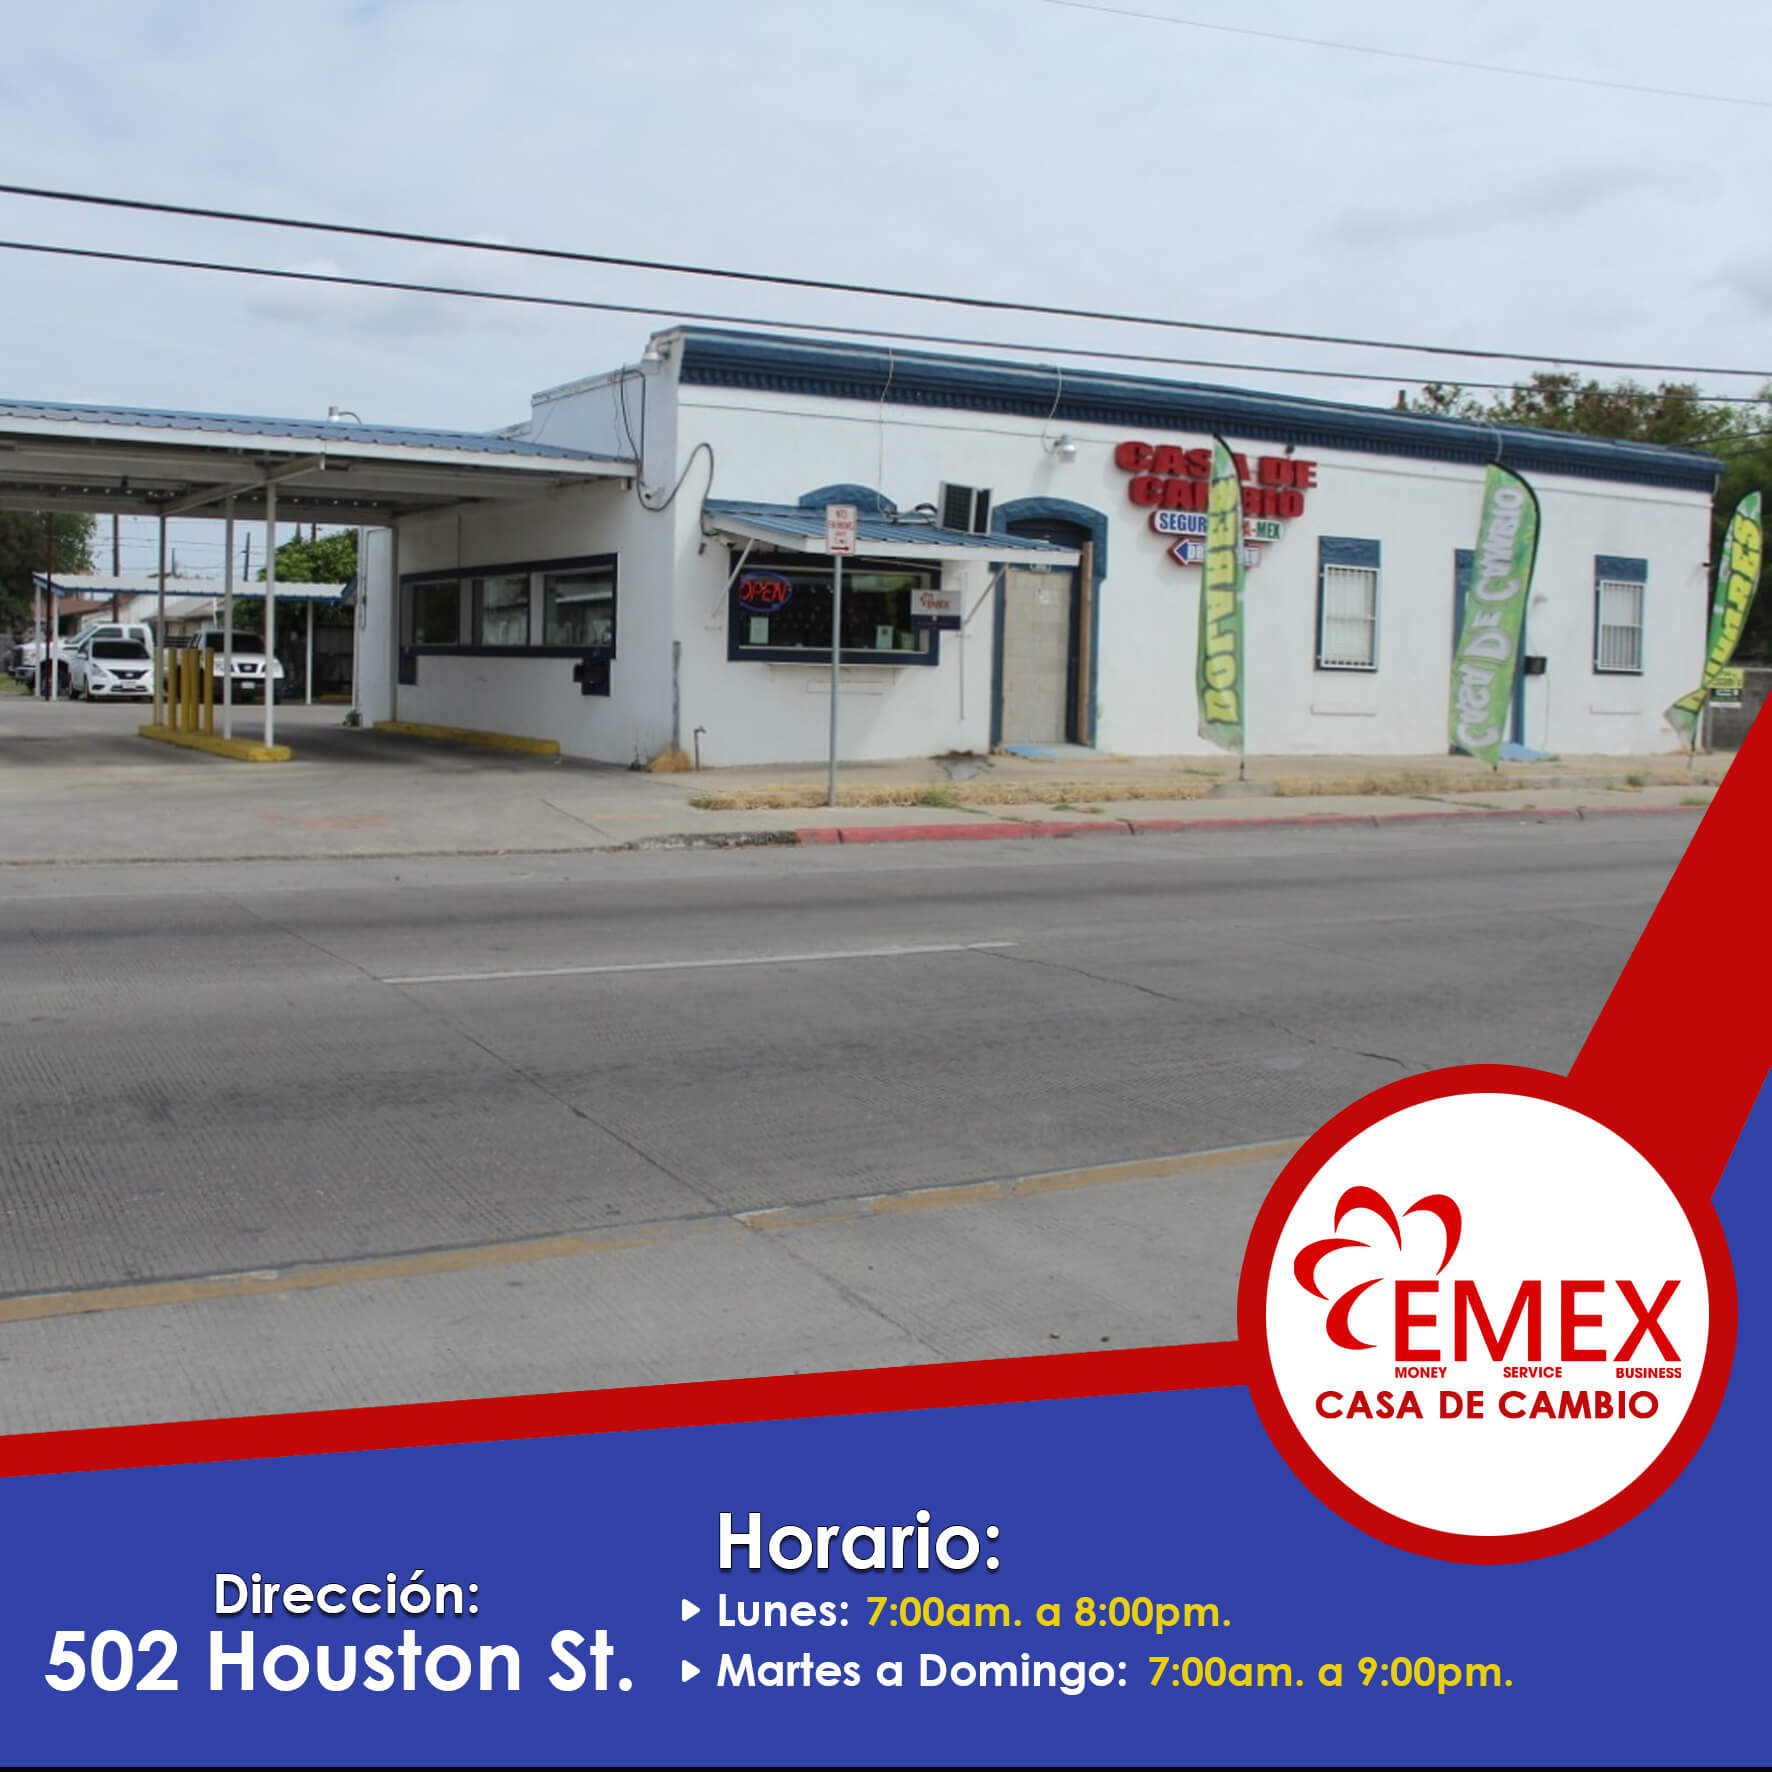 Houston (502 Houston St)